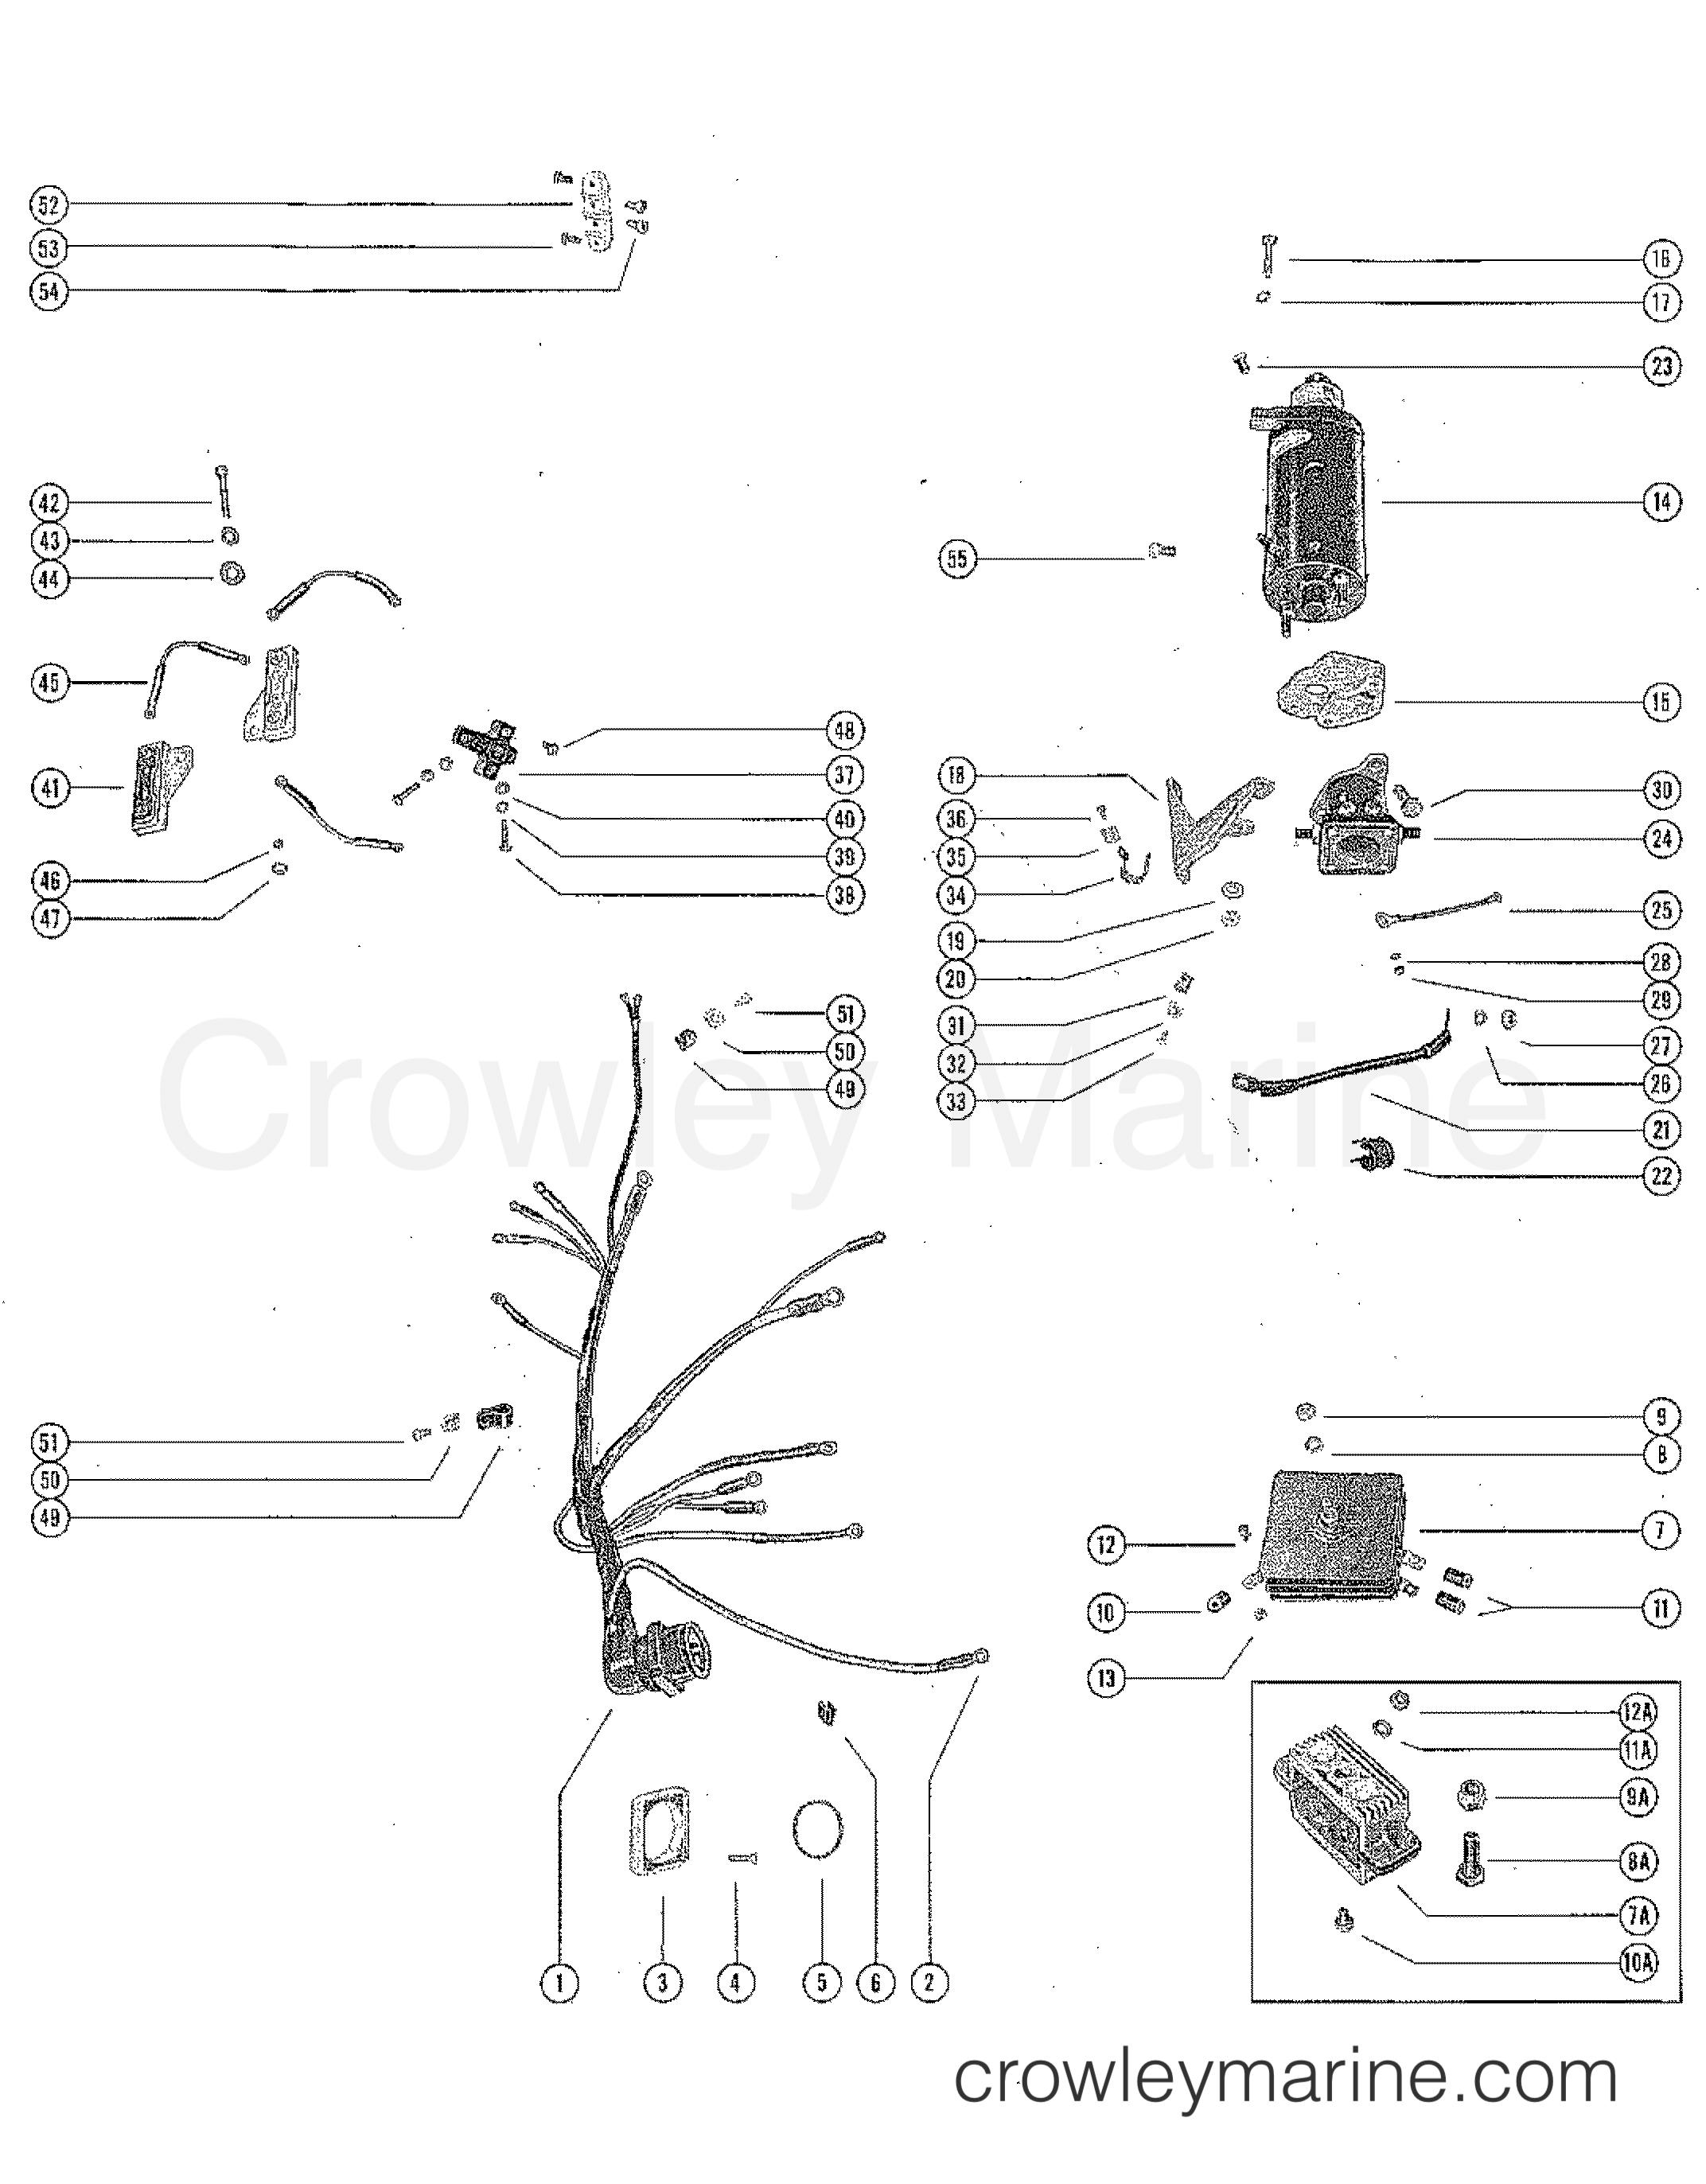 dual car audio wiring harness diagram xd5125 , 85 gmc wiring diagram ,  kelvinator refrigerator wiring diagram , 2006 mustang fuse diagram